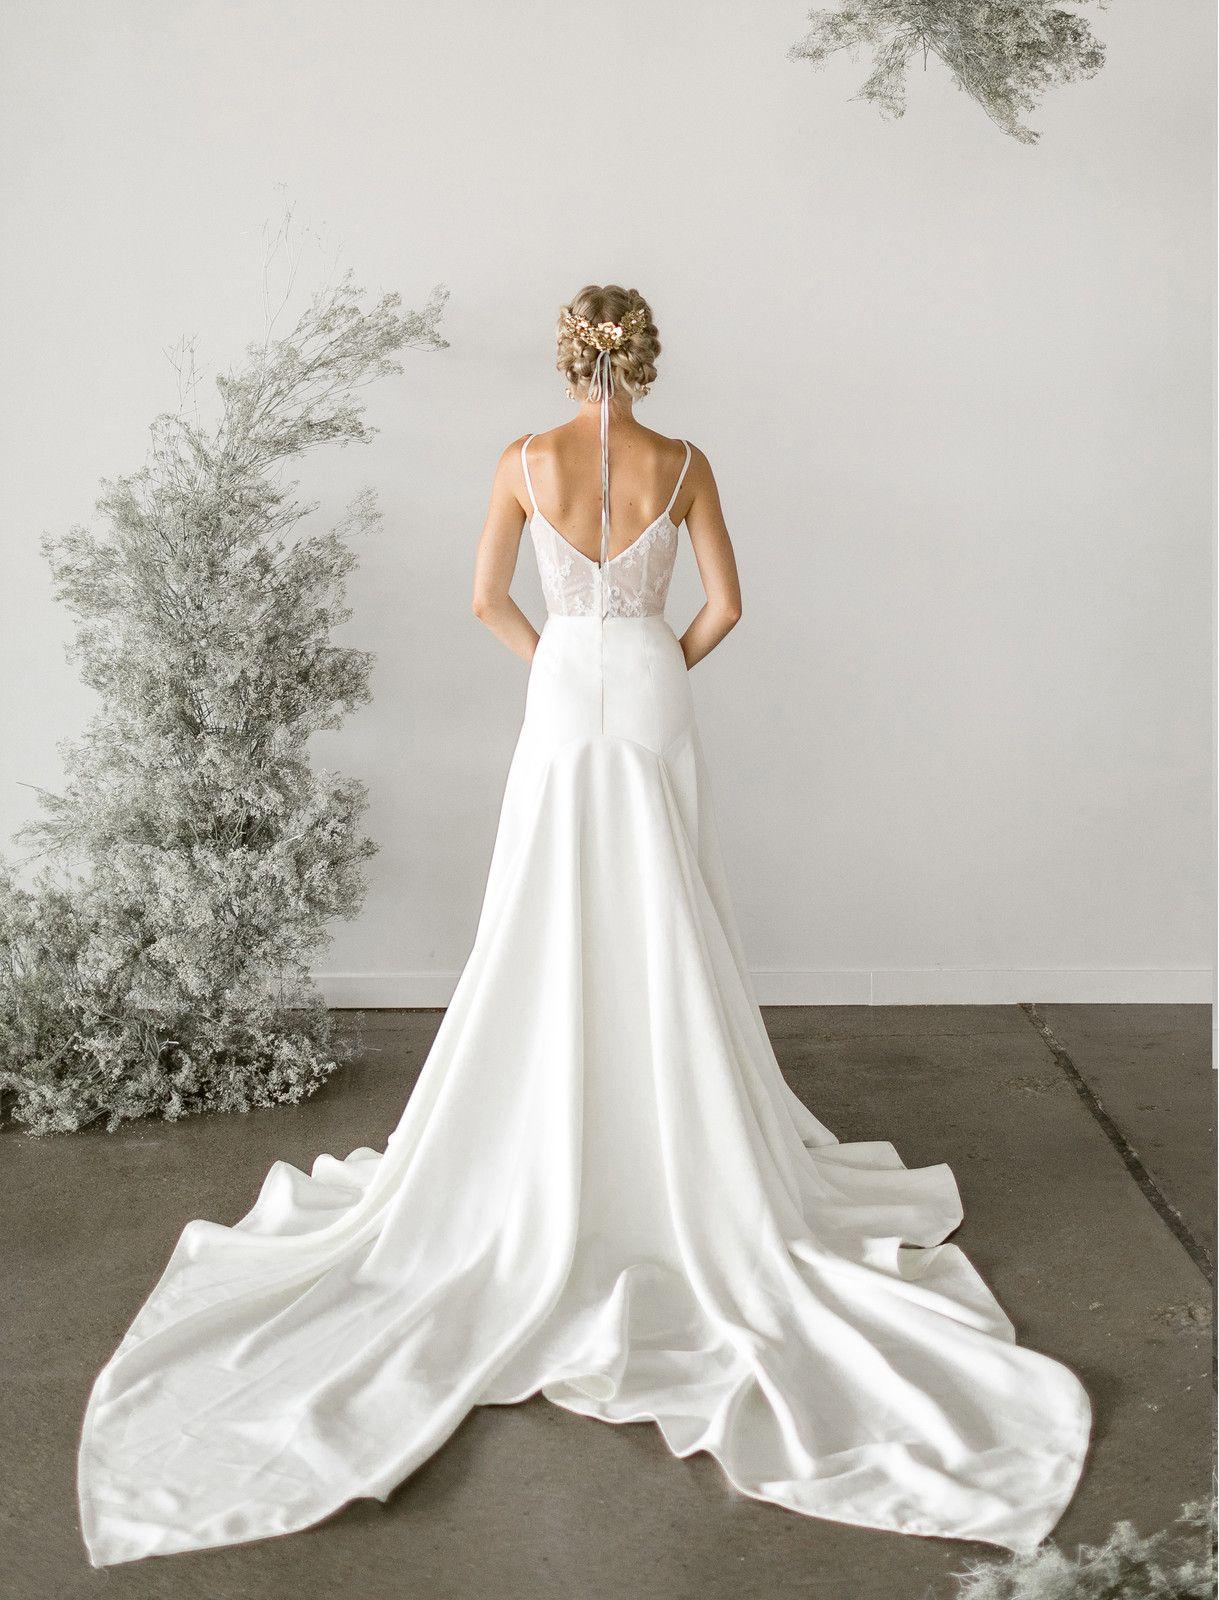 Wedding Dress Designers Wedding Dresses Lace Wedding Dresses With Straps Spaghetti Strap Wedding Dress